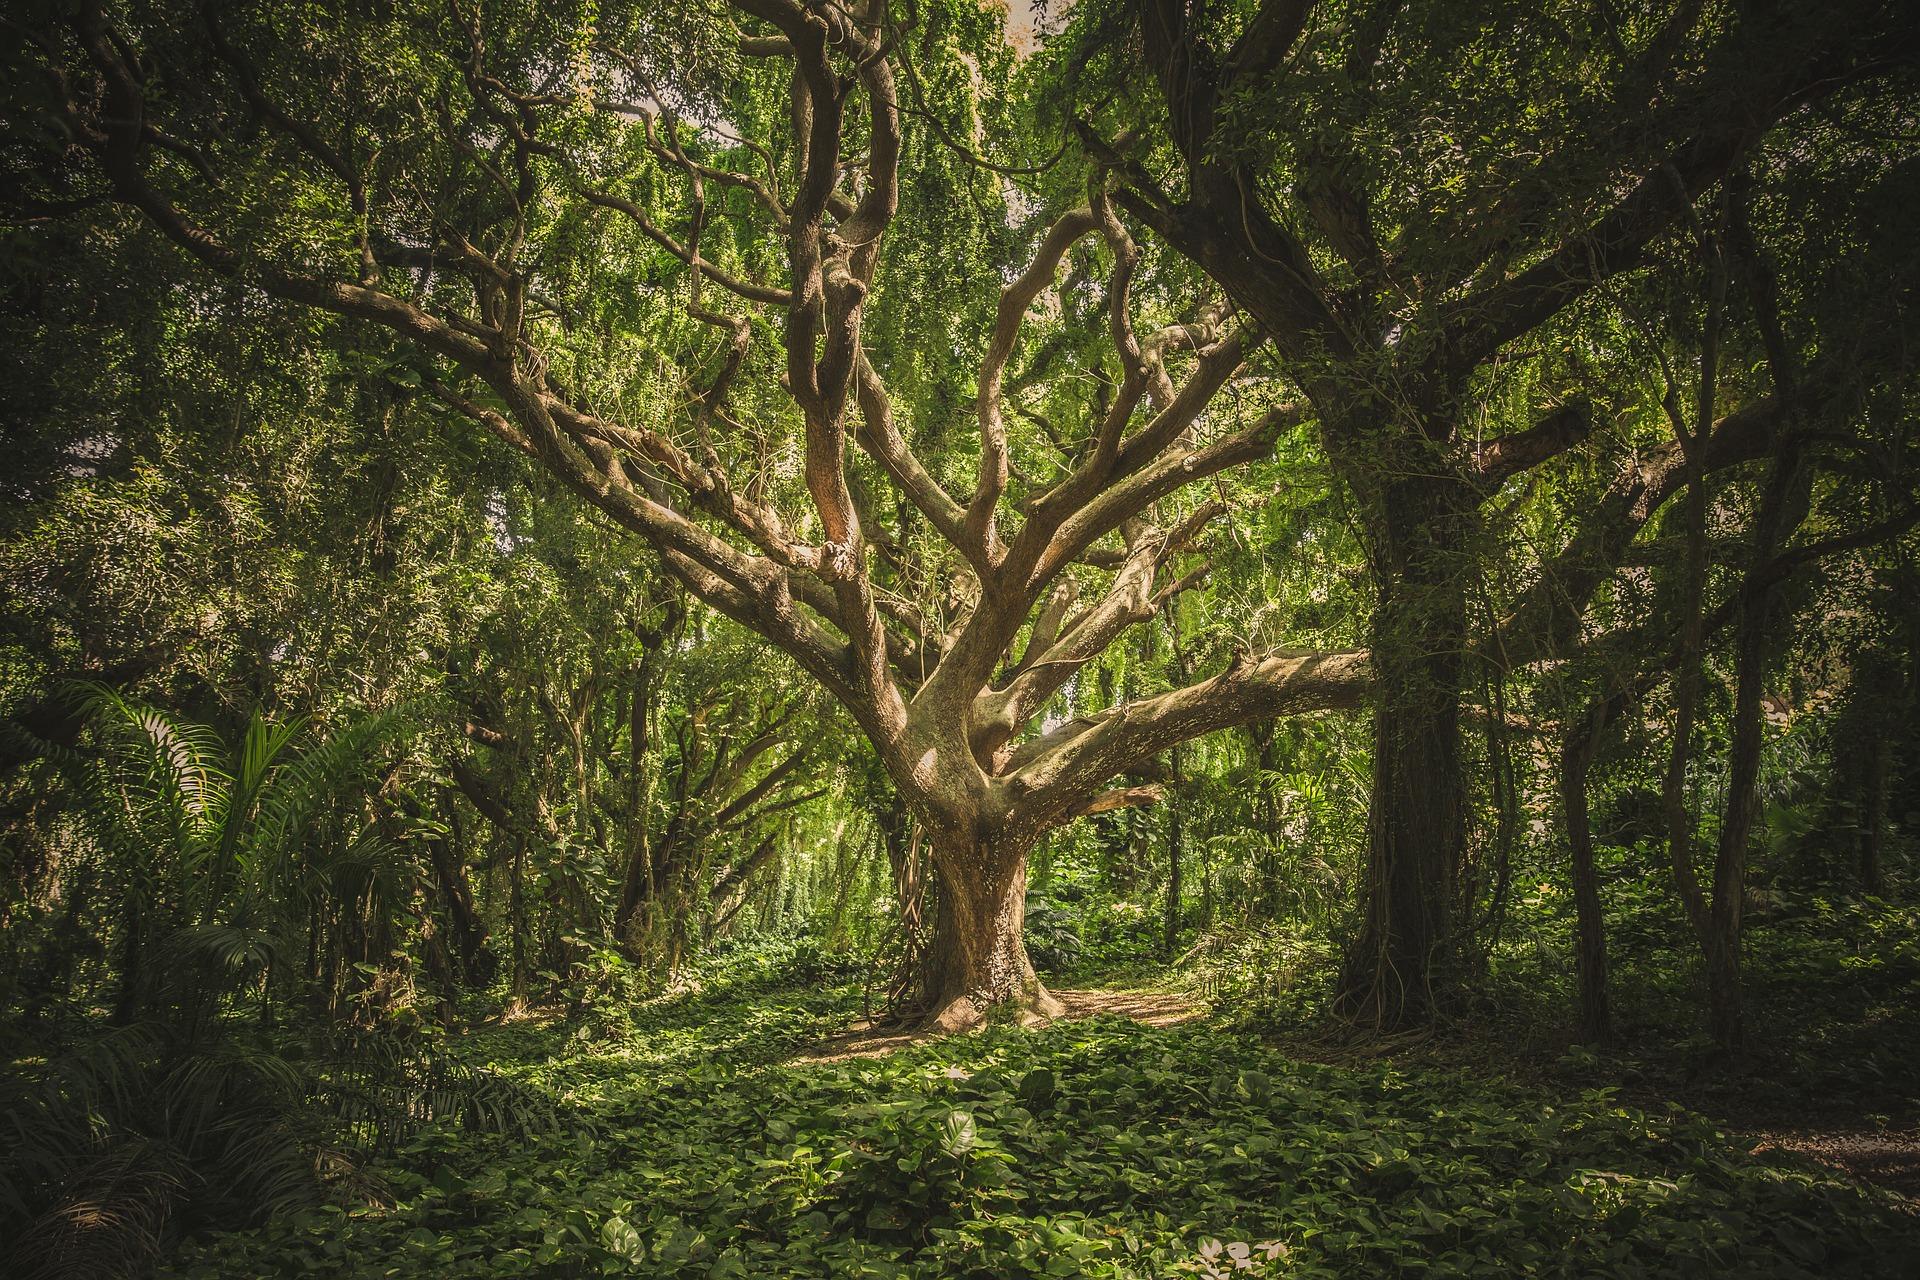 tree-1209774_1920.jpg